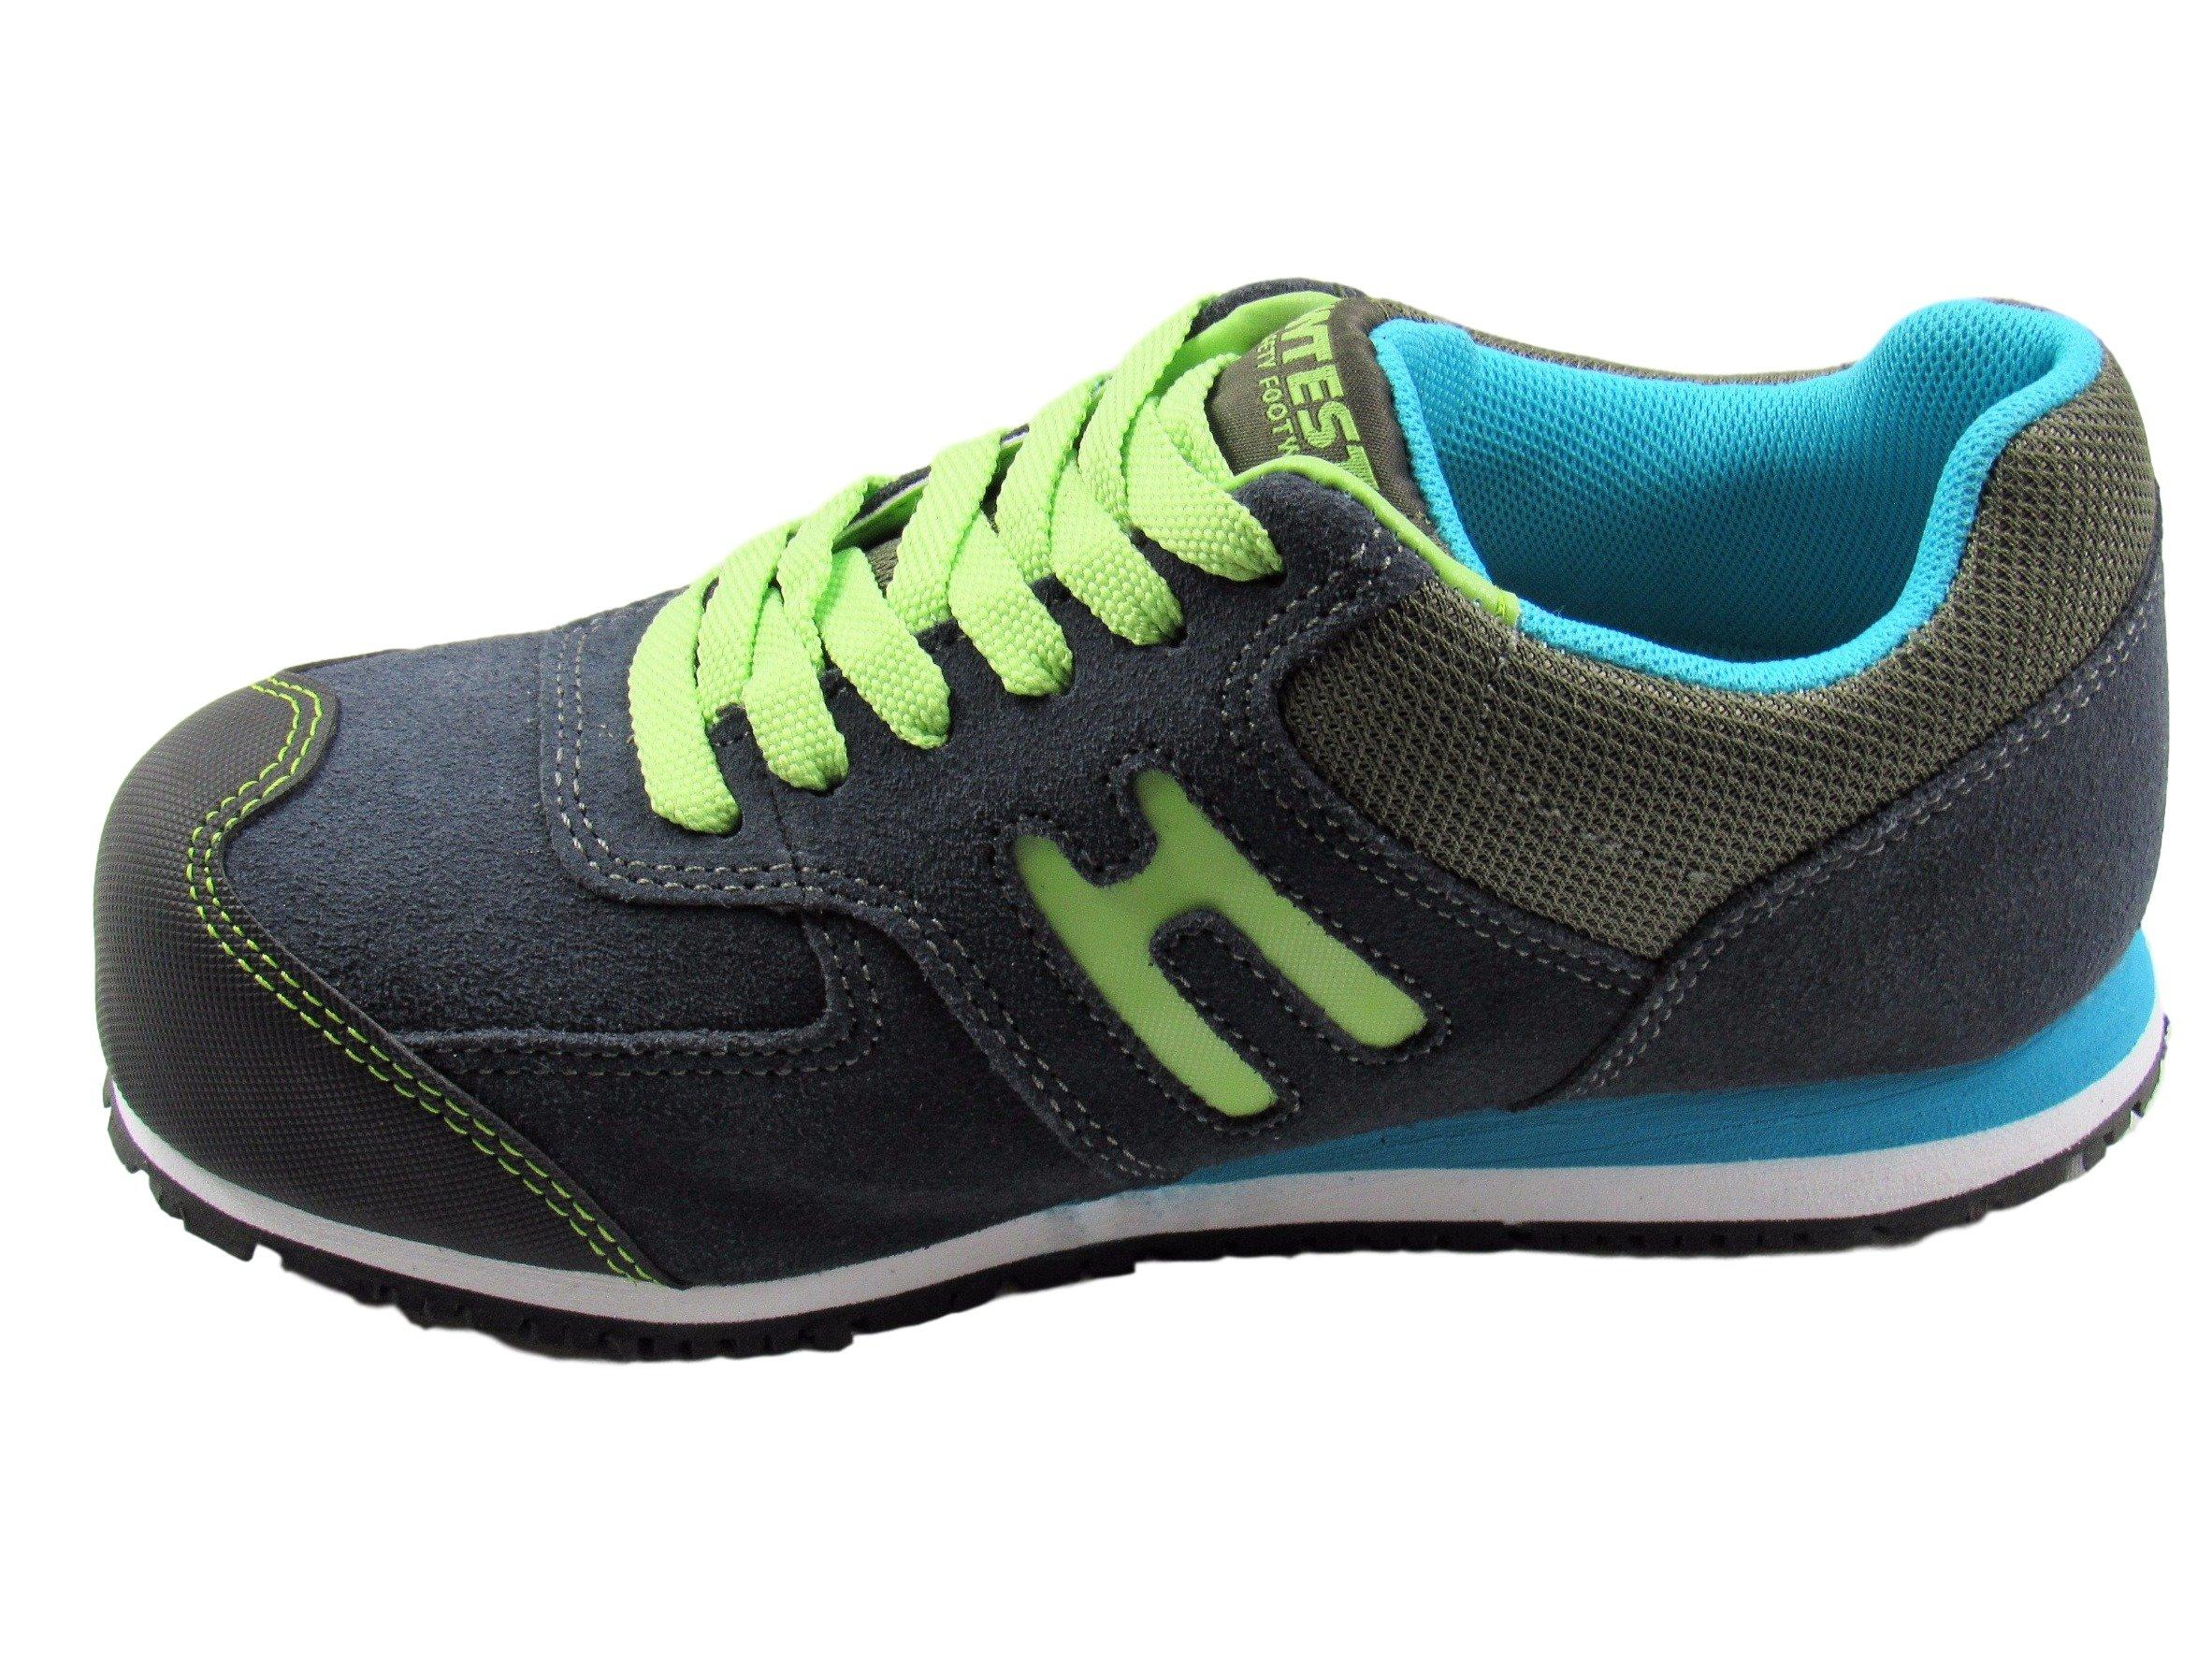 Hytest Women's Athletic Oxford Steel Toe, Electrical Hazard, Slip Resistant Safety Work Shoe (11W US, Navy)